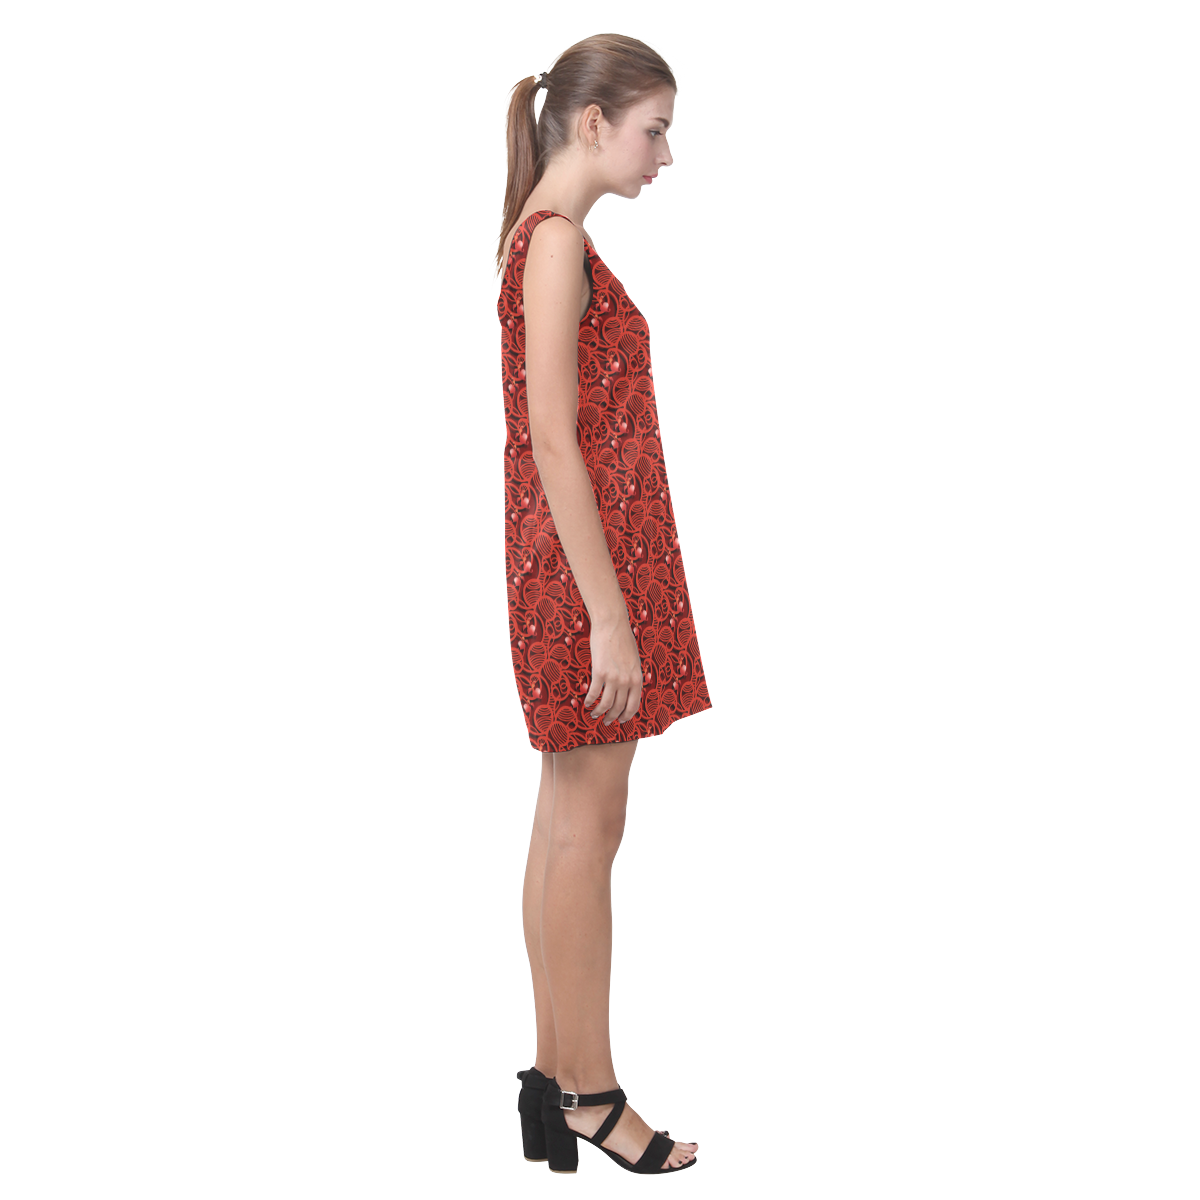 Cherry Tomato Red Hearts Helen Sleeveless Dress (Model D10)